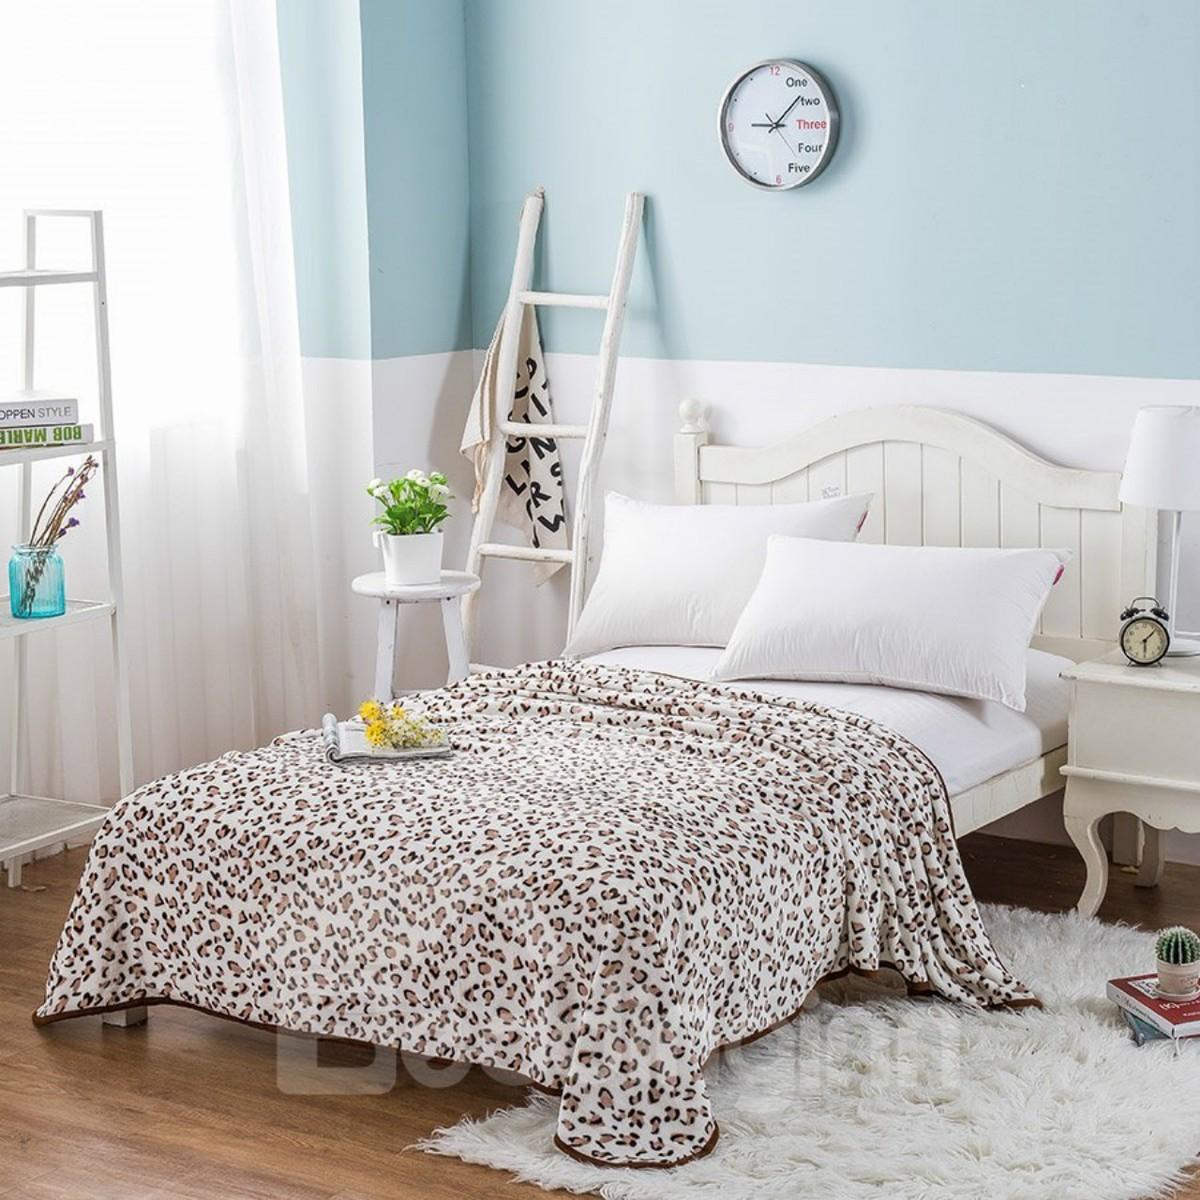 Leopard Spot Pattern Printing Soft Flannel Bed Blanket